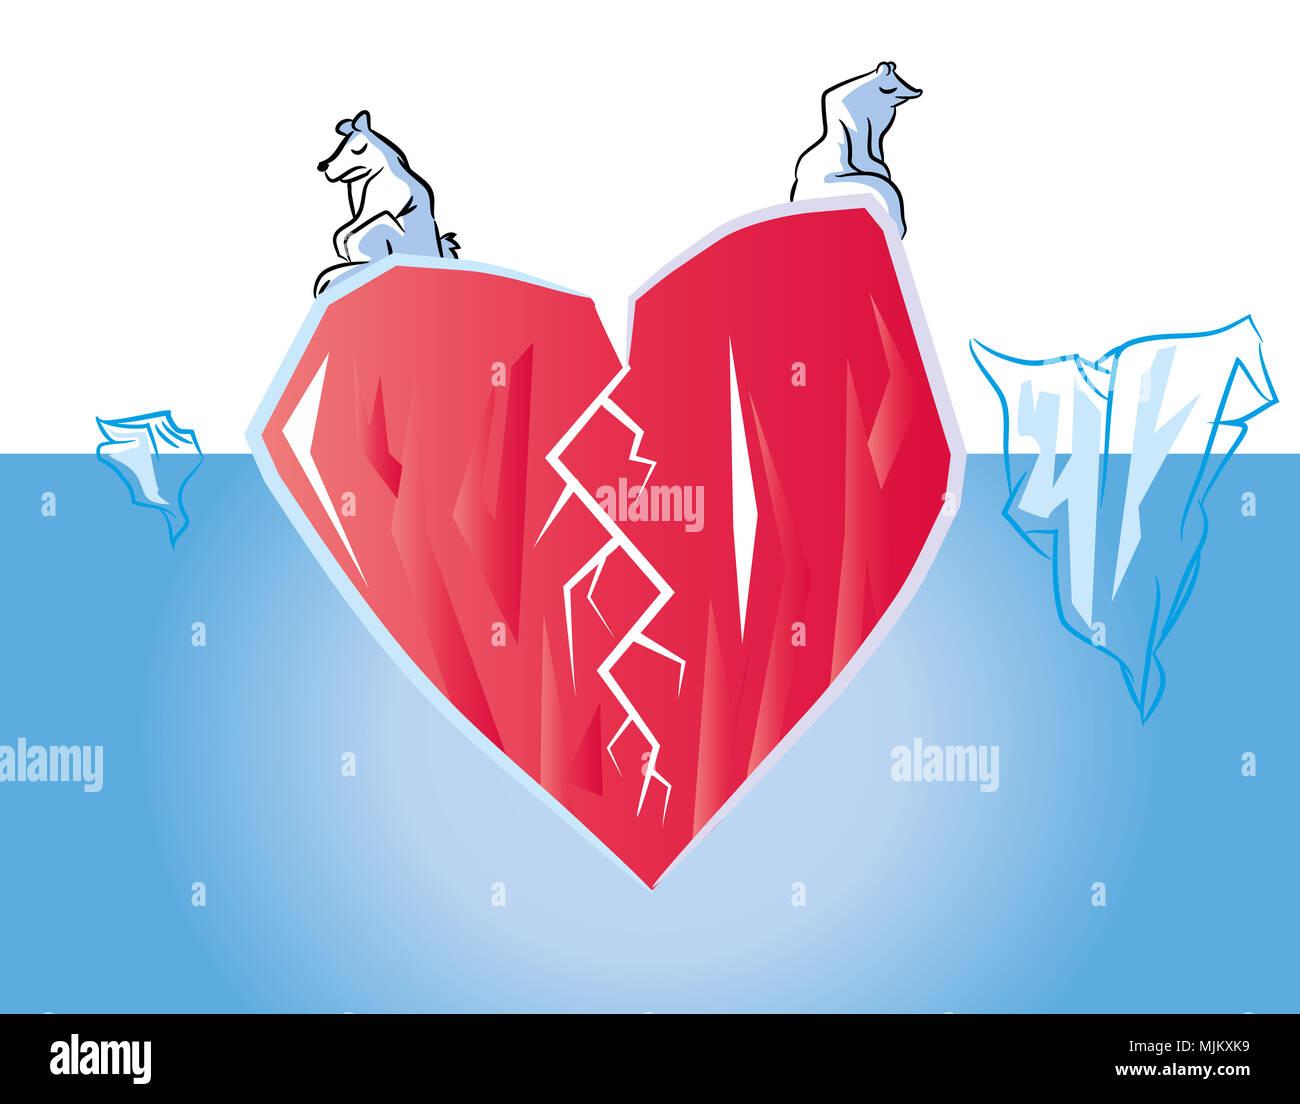 Unhappy Broken heart in poles (love concept) Symbolized heart Iceberg in Ocean with polar bears. - Stock Image